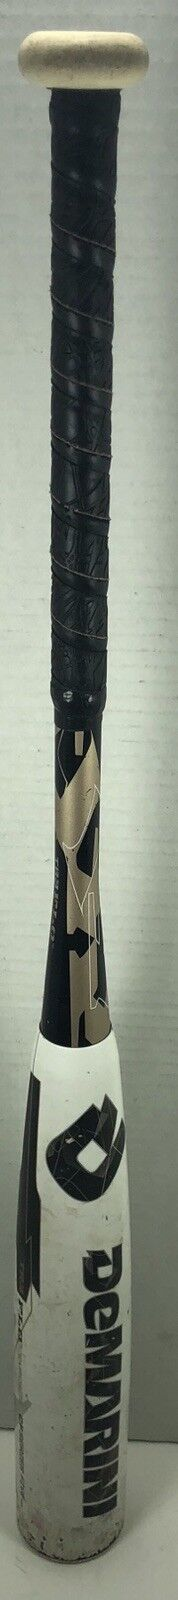 Demarini CF5 TR3 FLO Baseball Bat 31 21 -10 Composite USSSA 31  21 oz CFX13